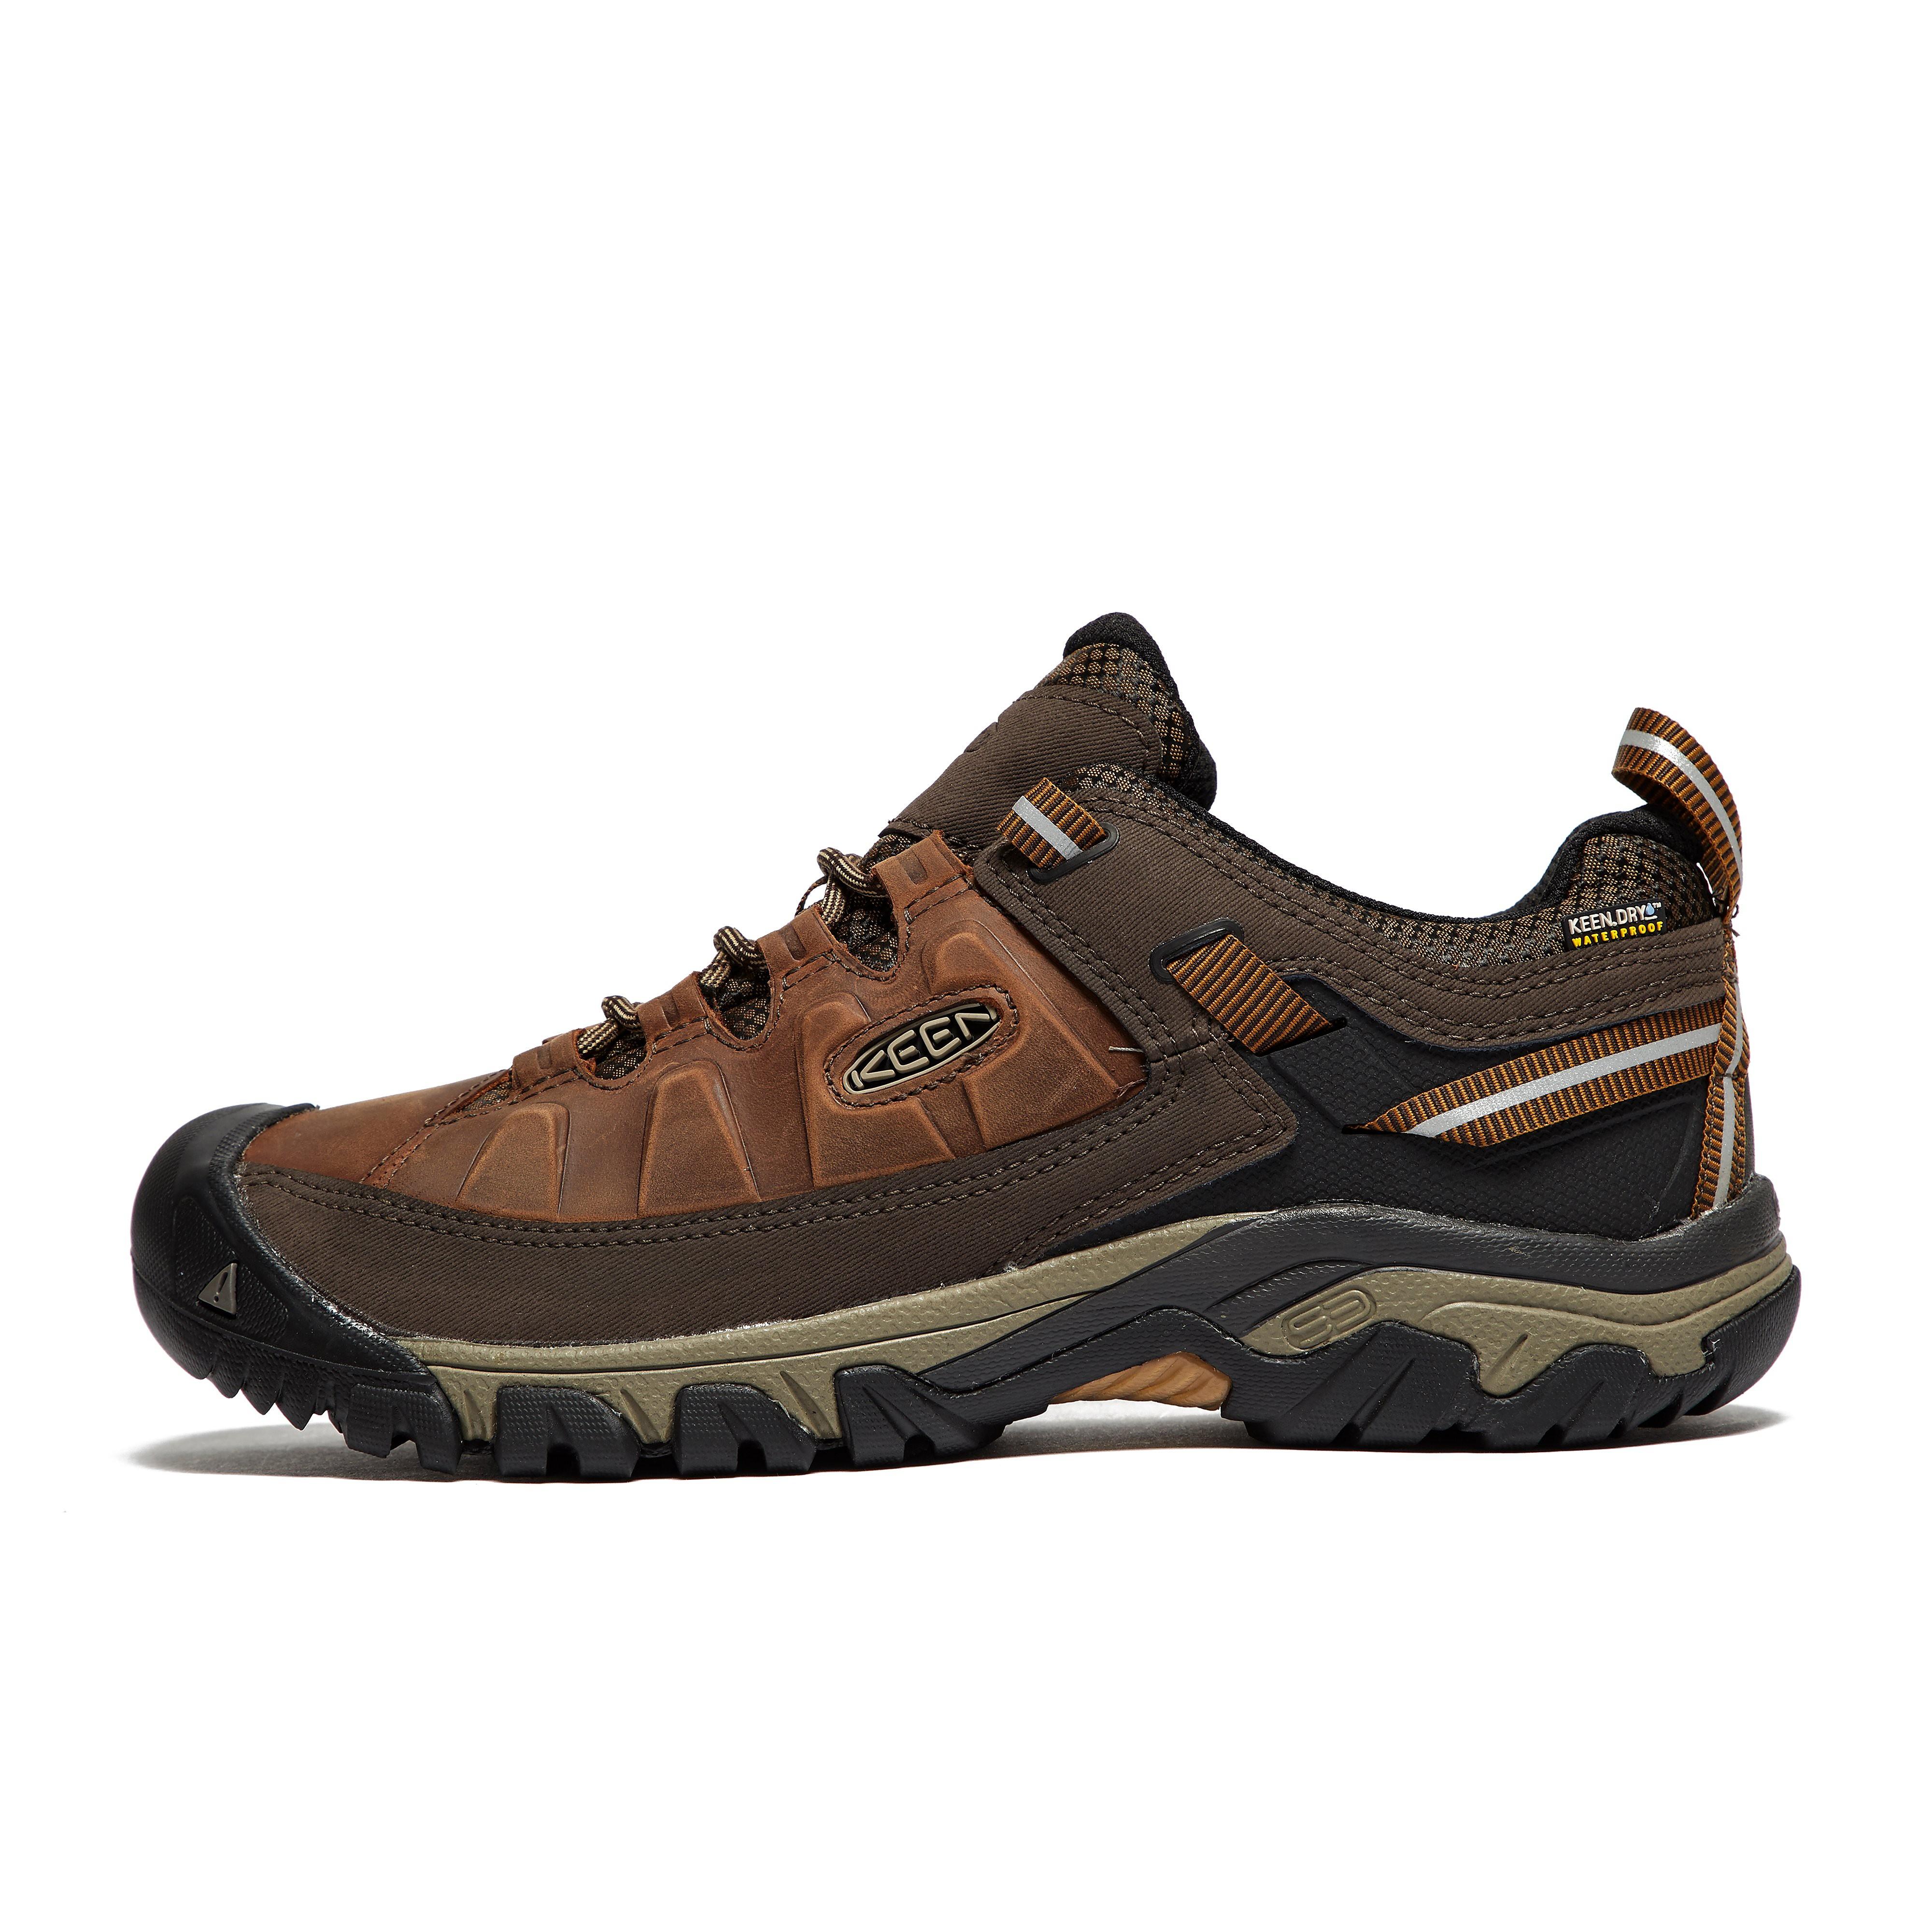 Keen Targhee III Men's Hiking Shoes